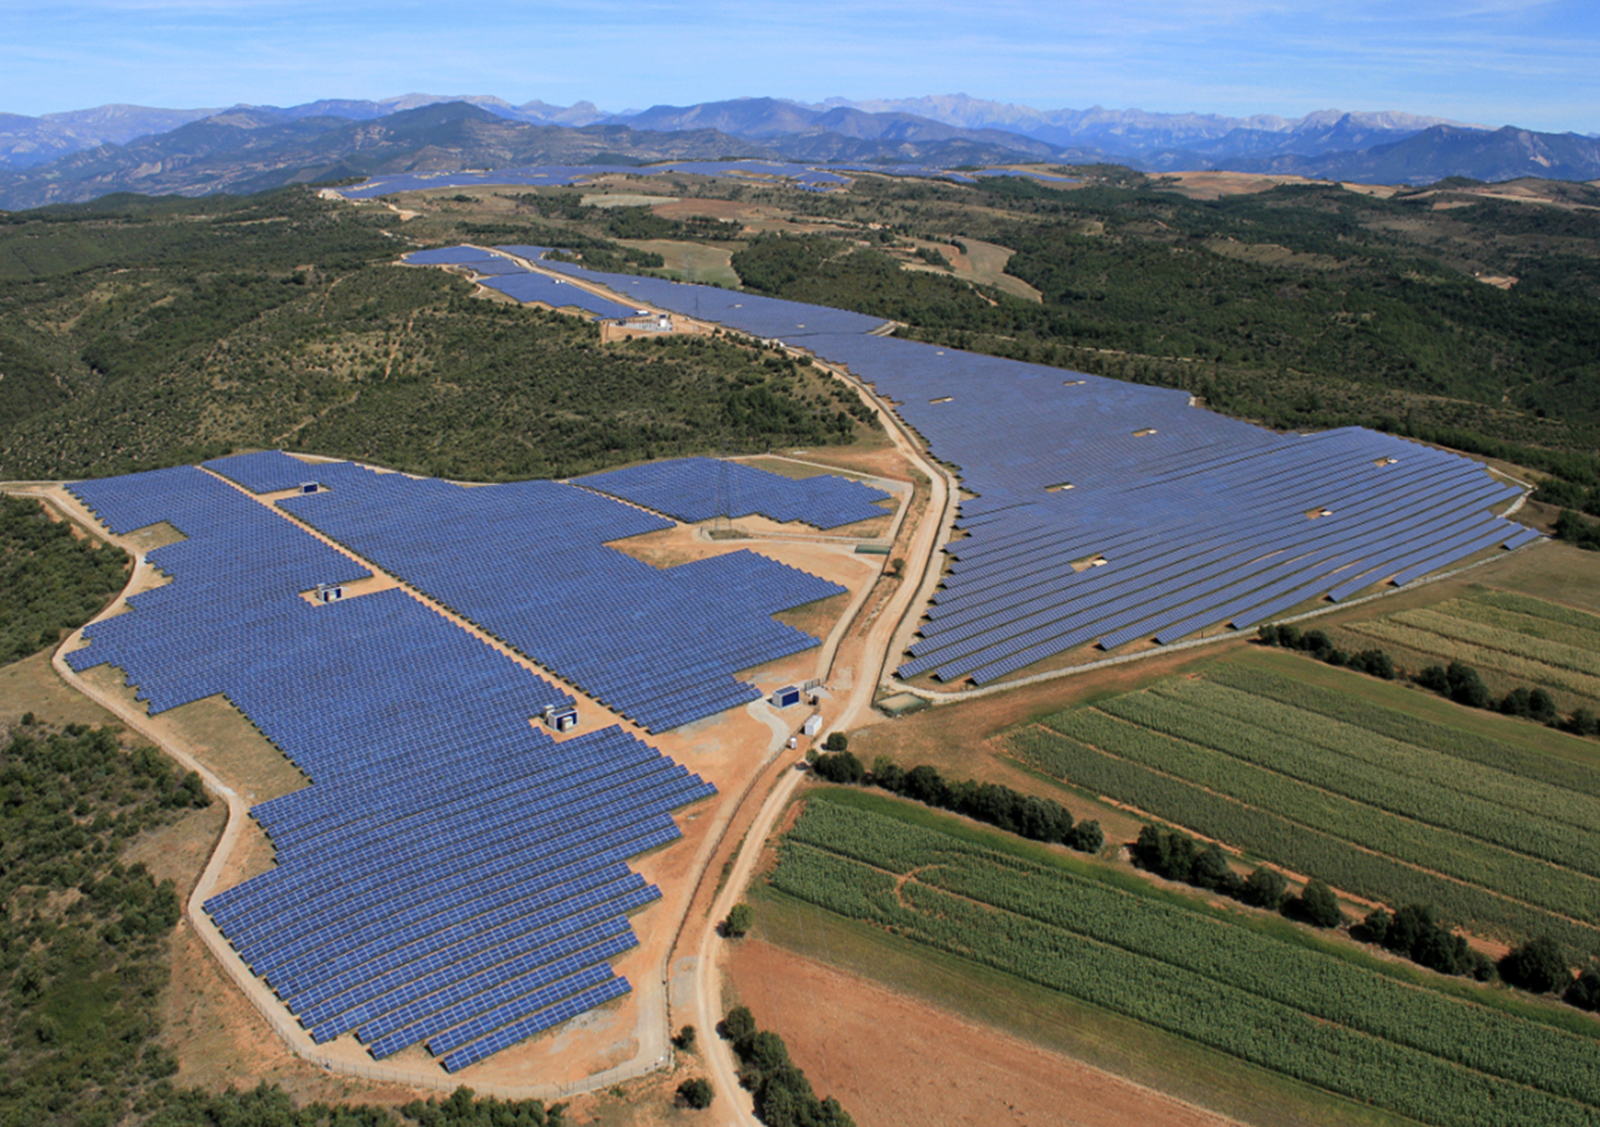 1446806976177_fk05_fo2_g_Solaranlagen optimal planen